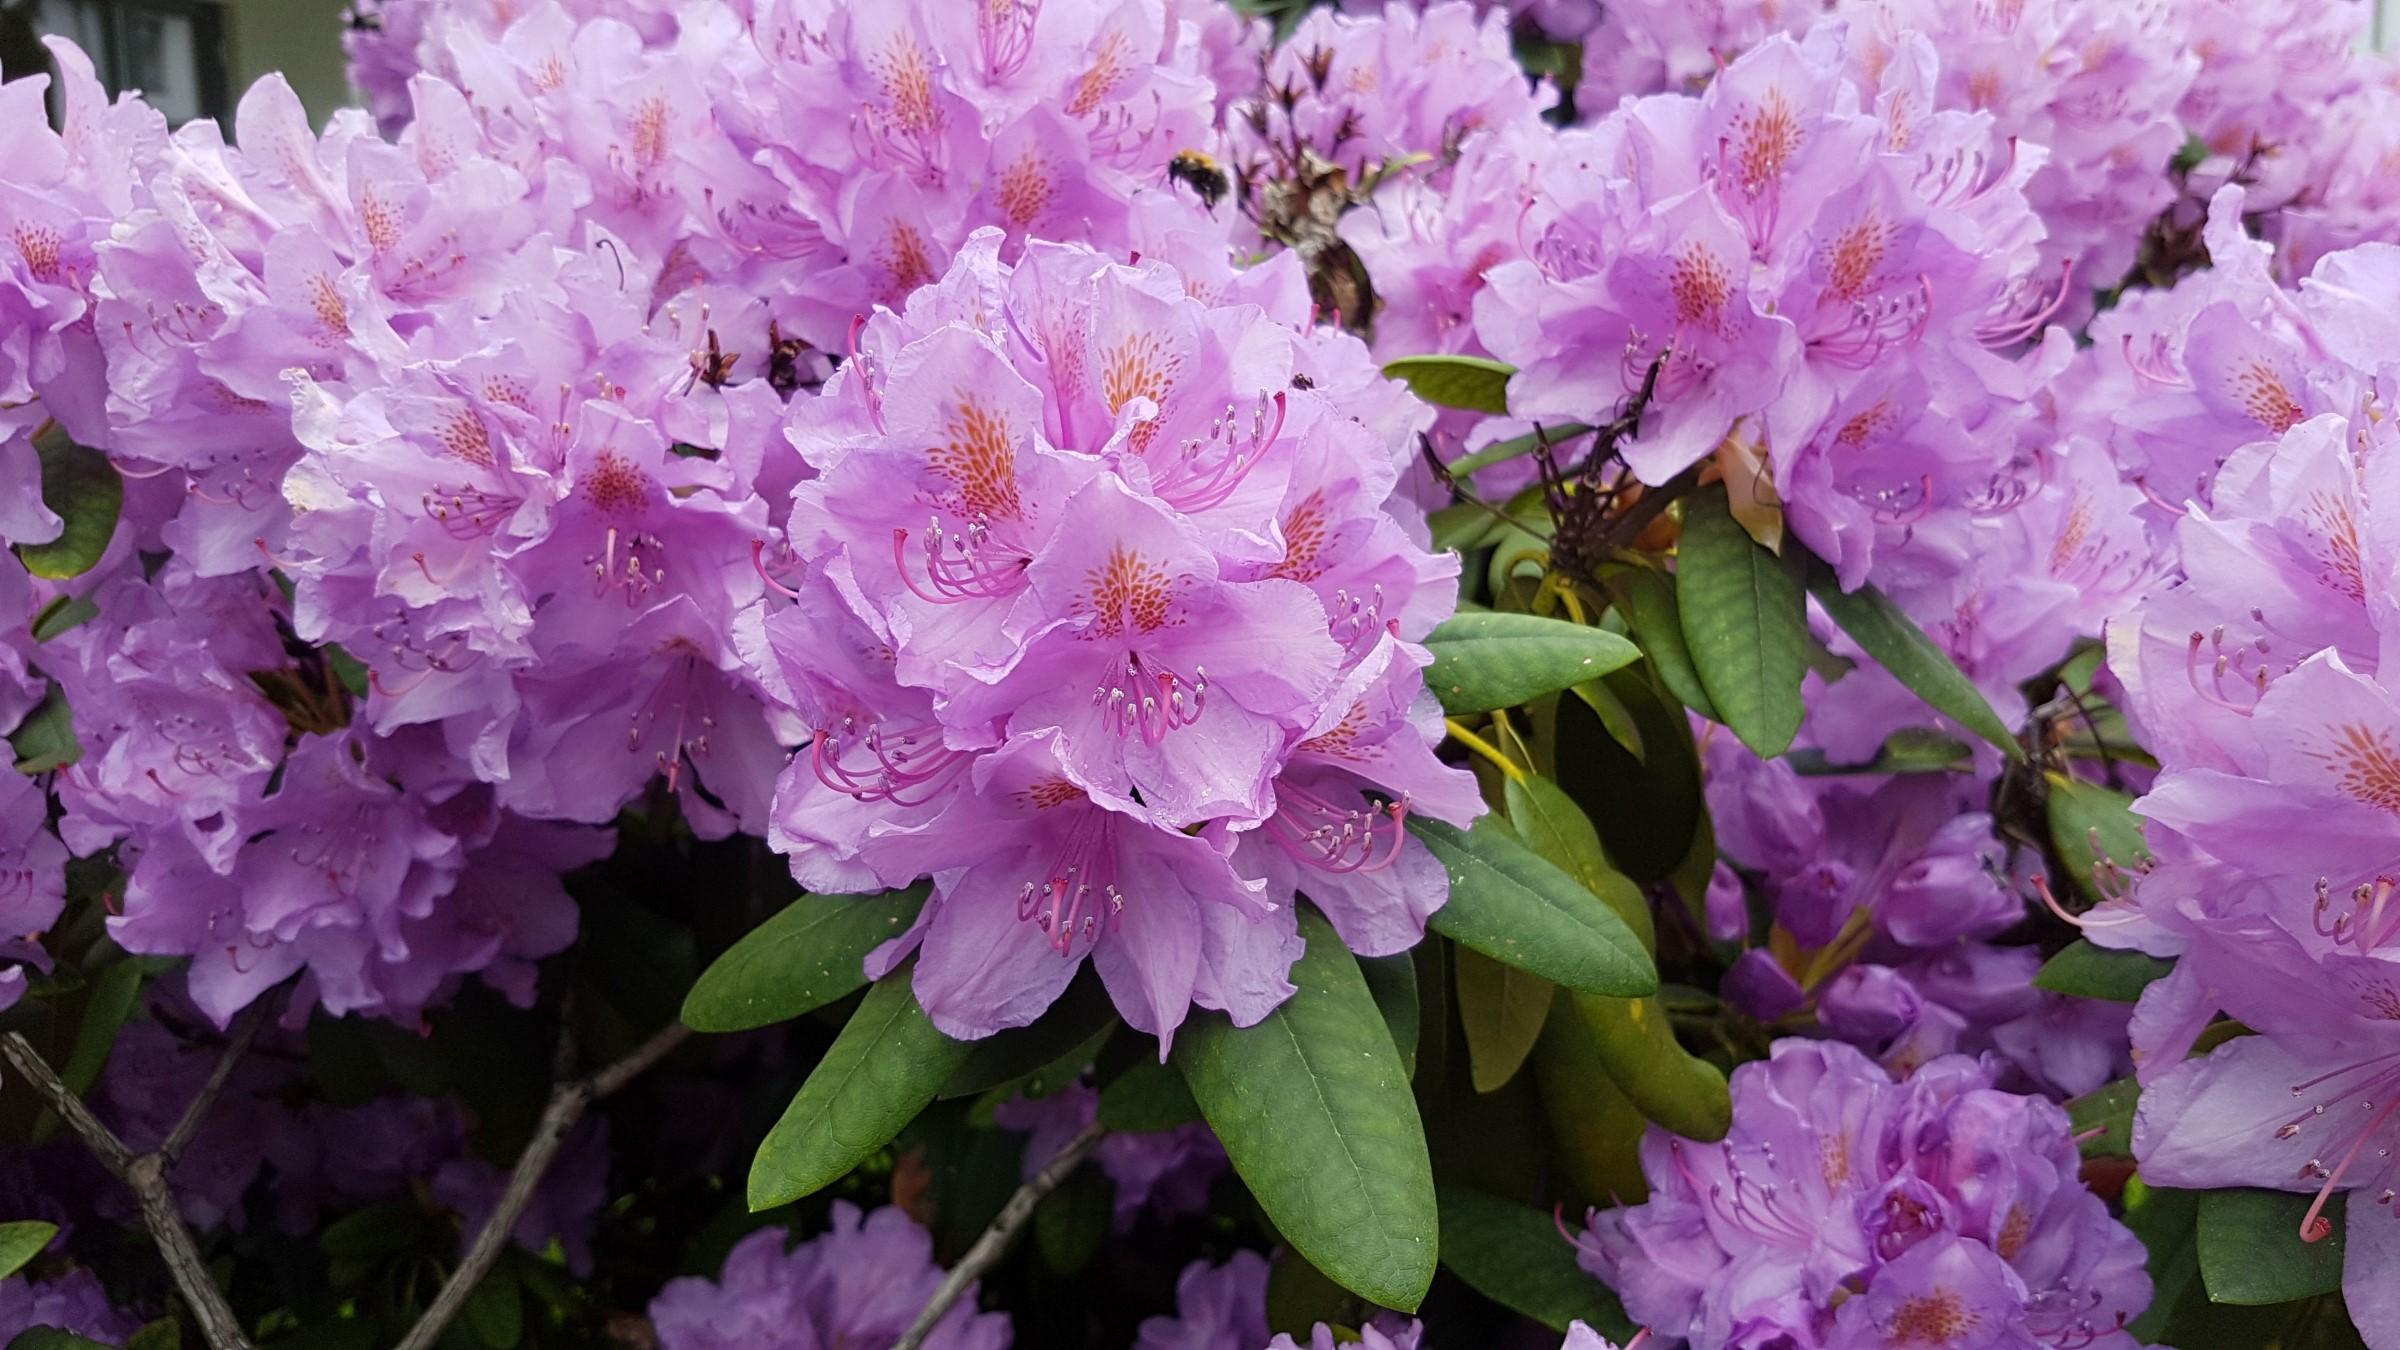 Rhododendron med rosa-lilla blomster